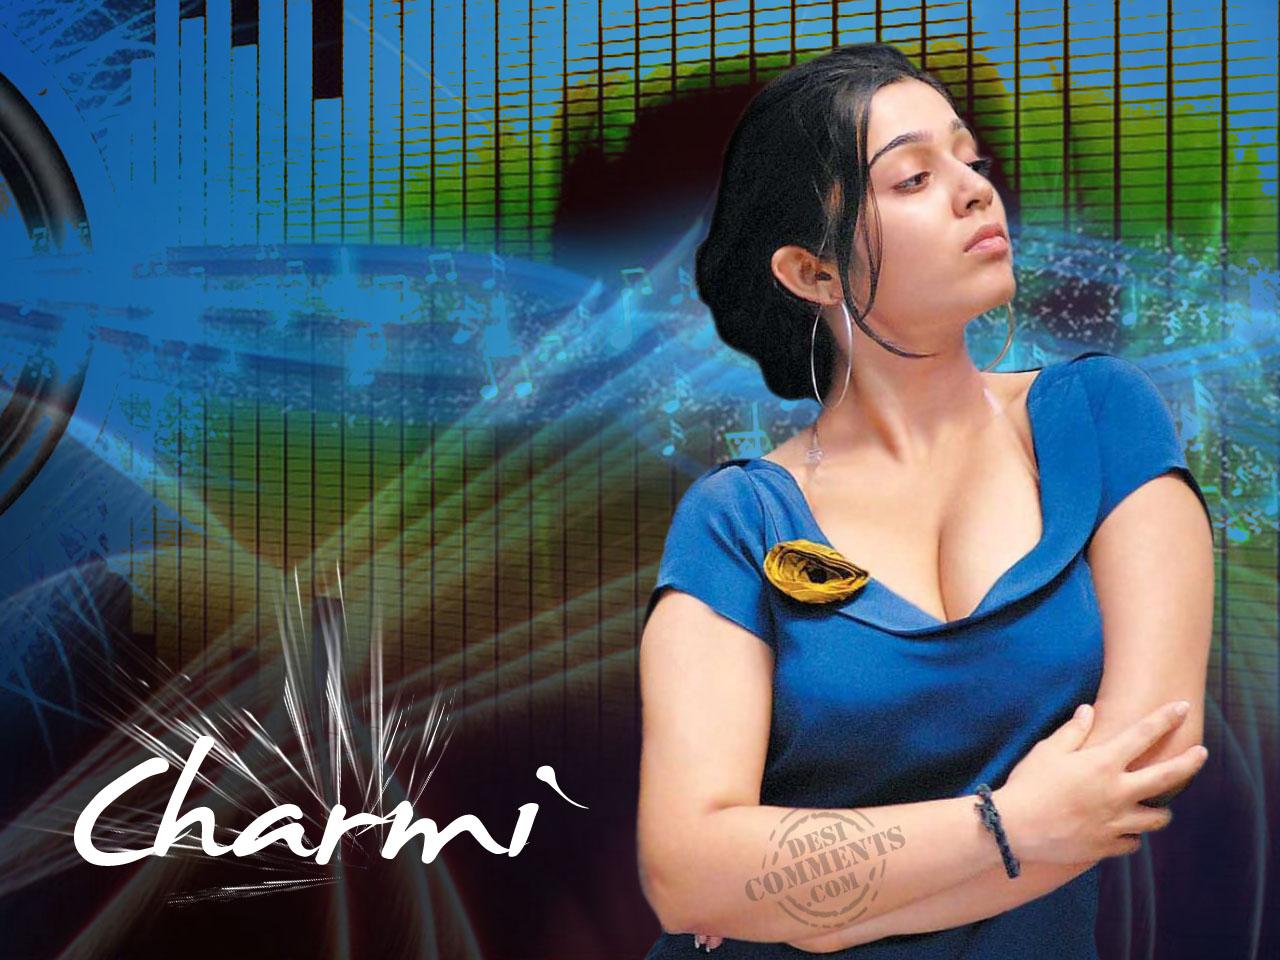 CINECORNER: Telugu Actress Charmi Wallpapers